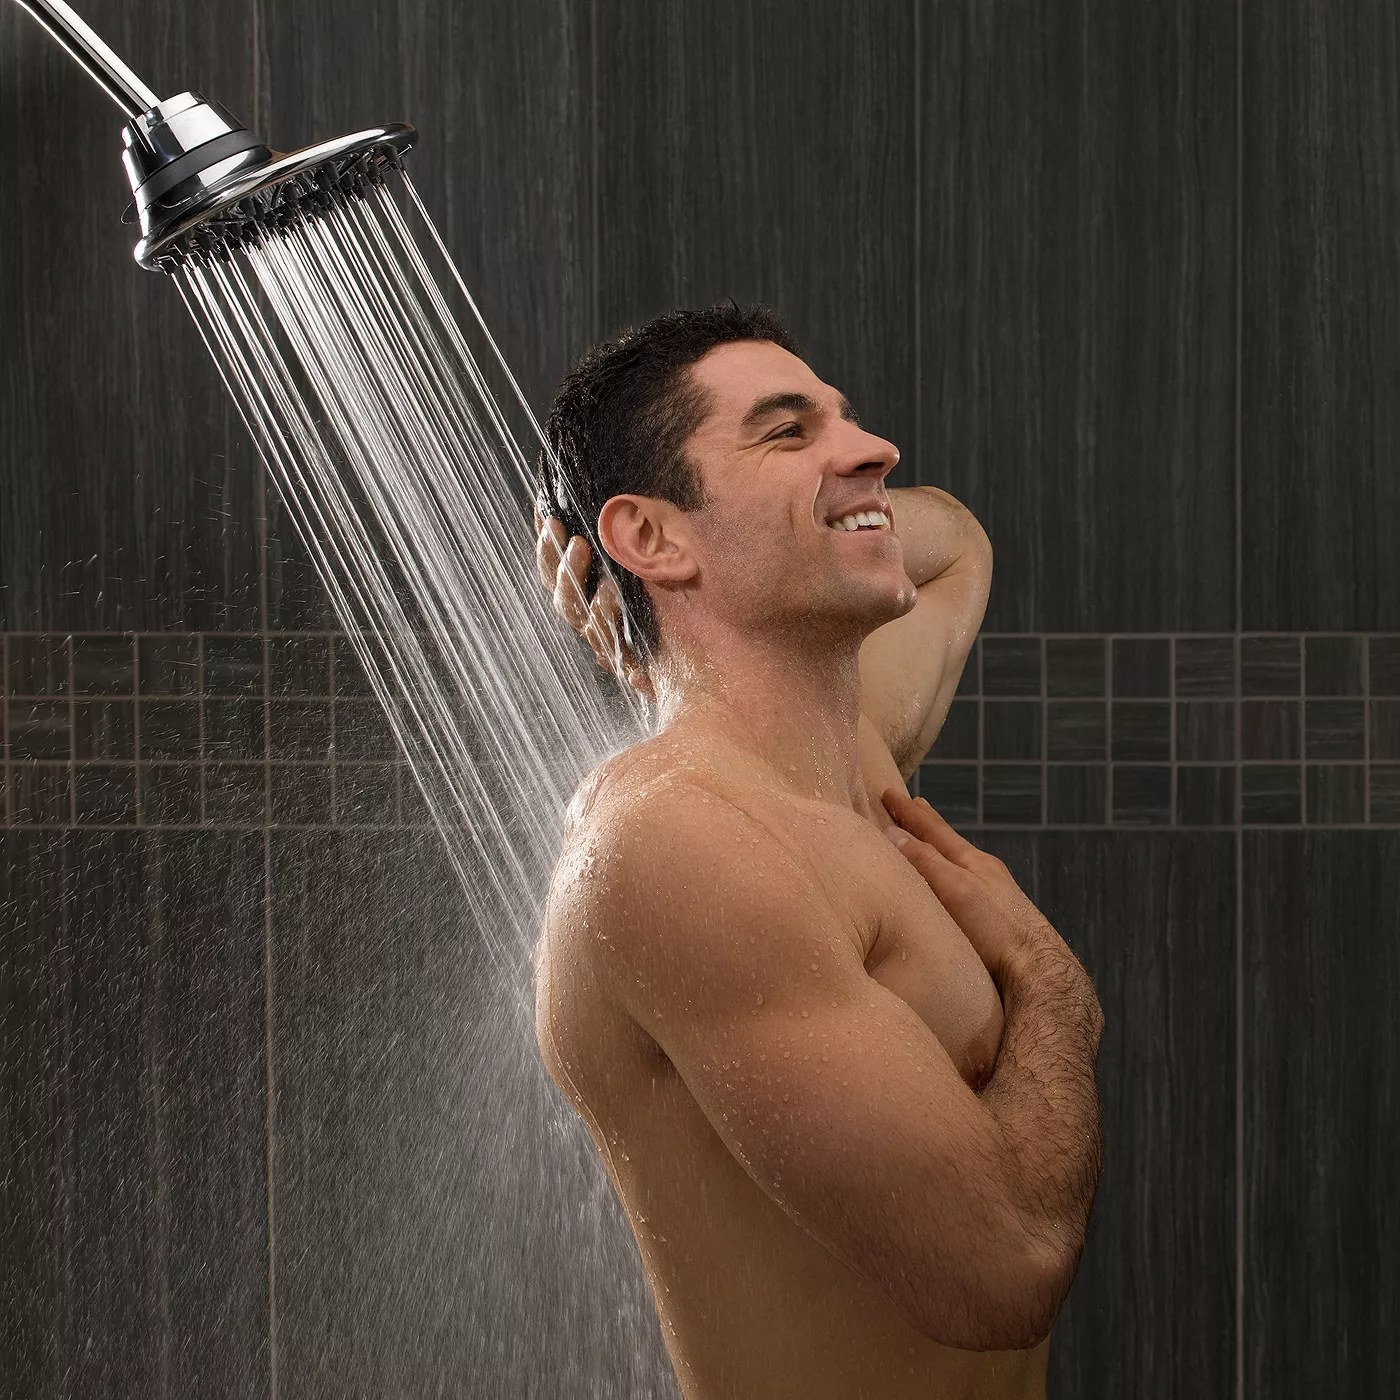 A smiling man showering using showerhead